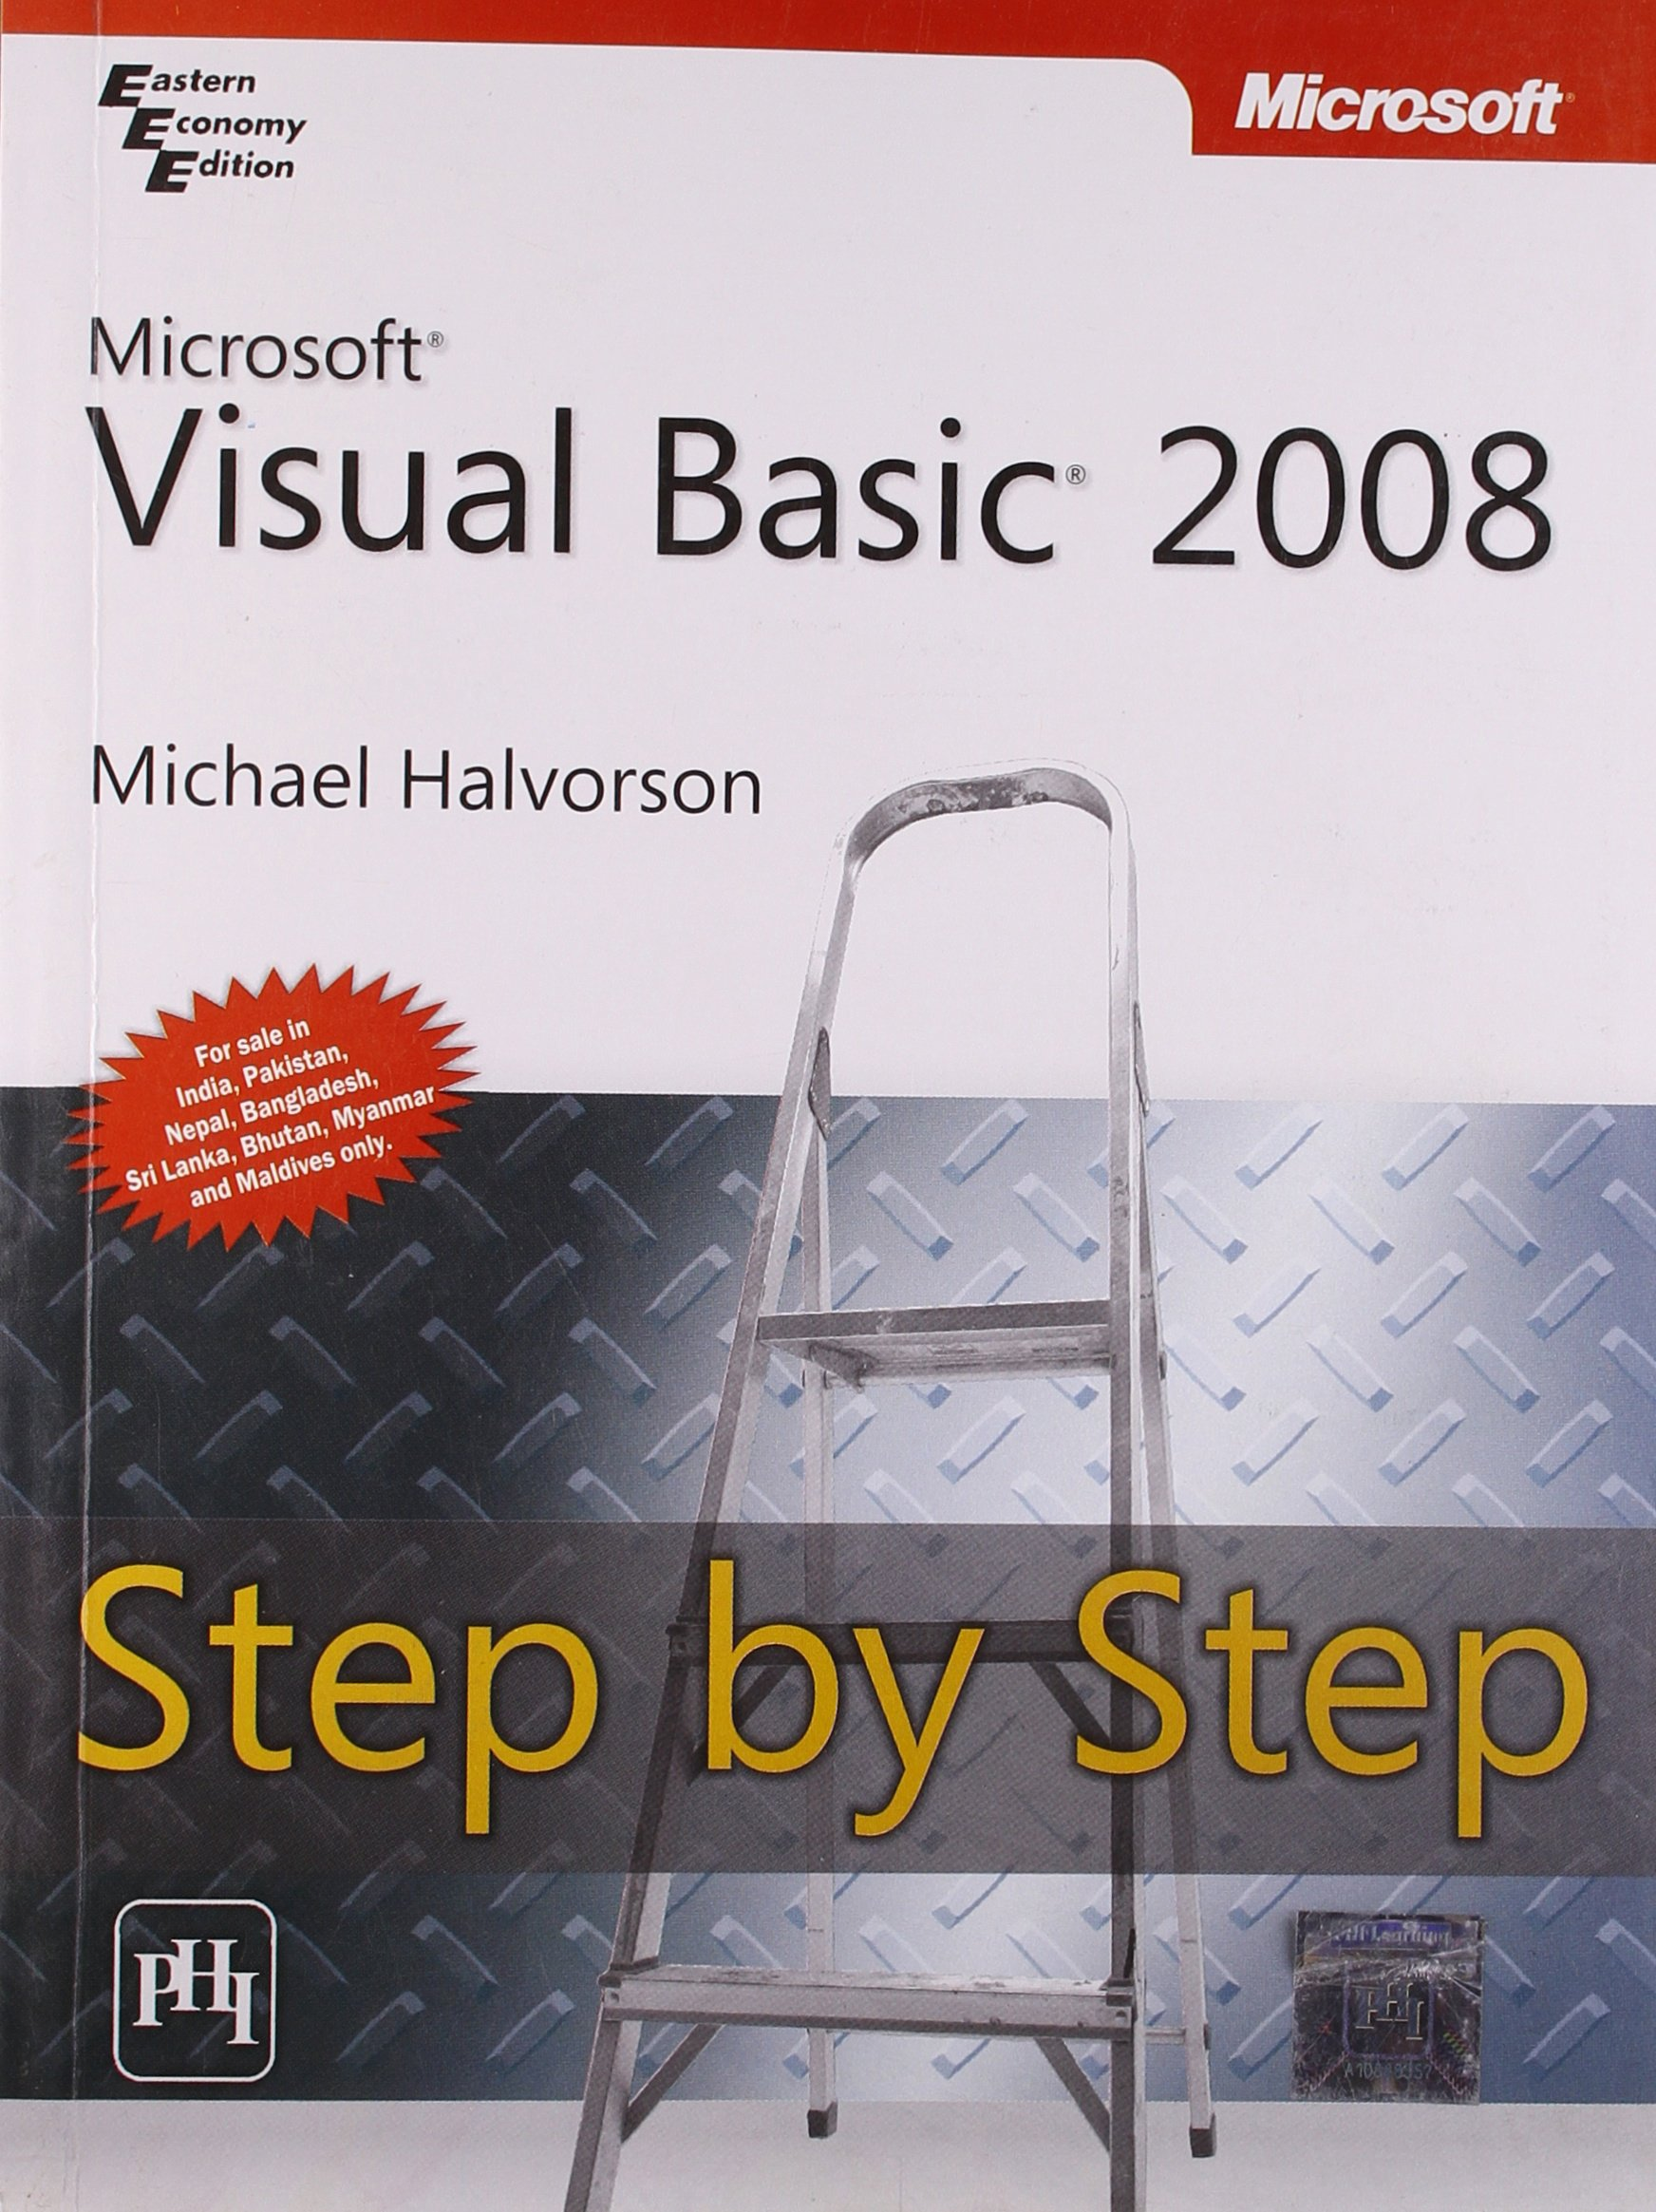 Microsoft Visual Basic 2008: Step by Step: Michael Halvorson:  9788120334588: Amazon.com: Books